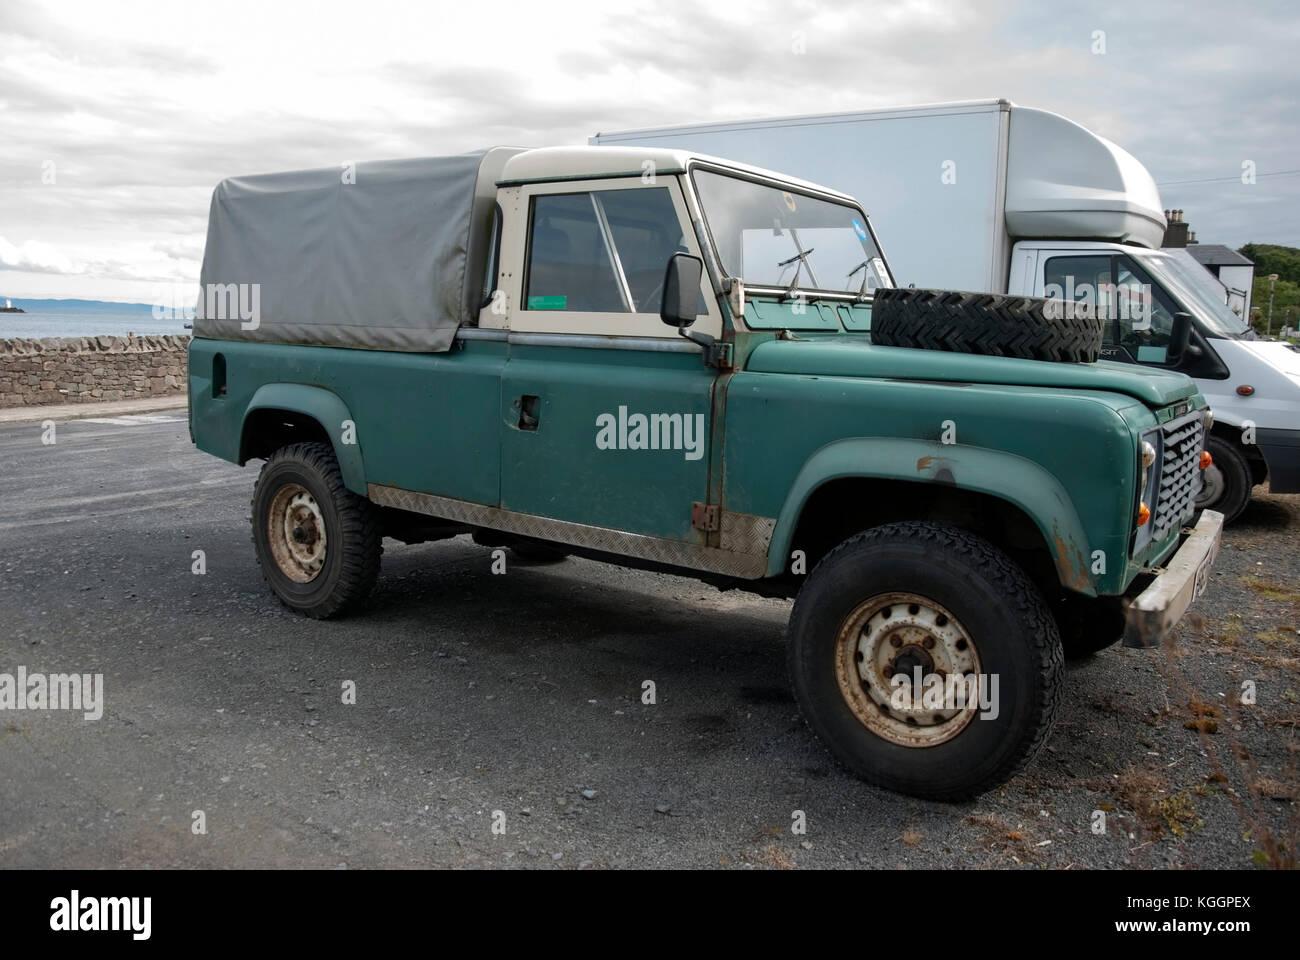 1980's Green White Land Rover Defender 110 Pick up